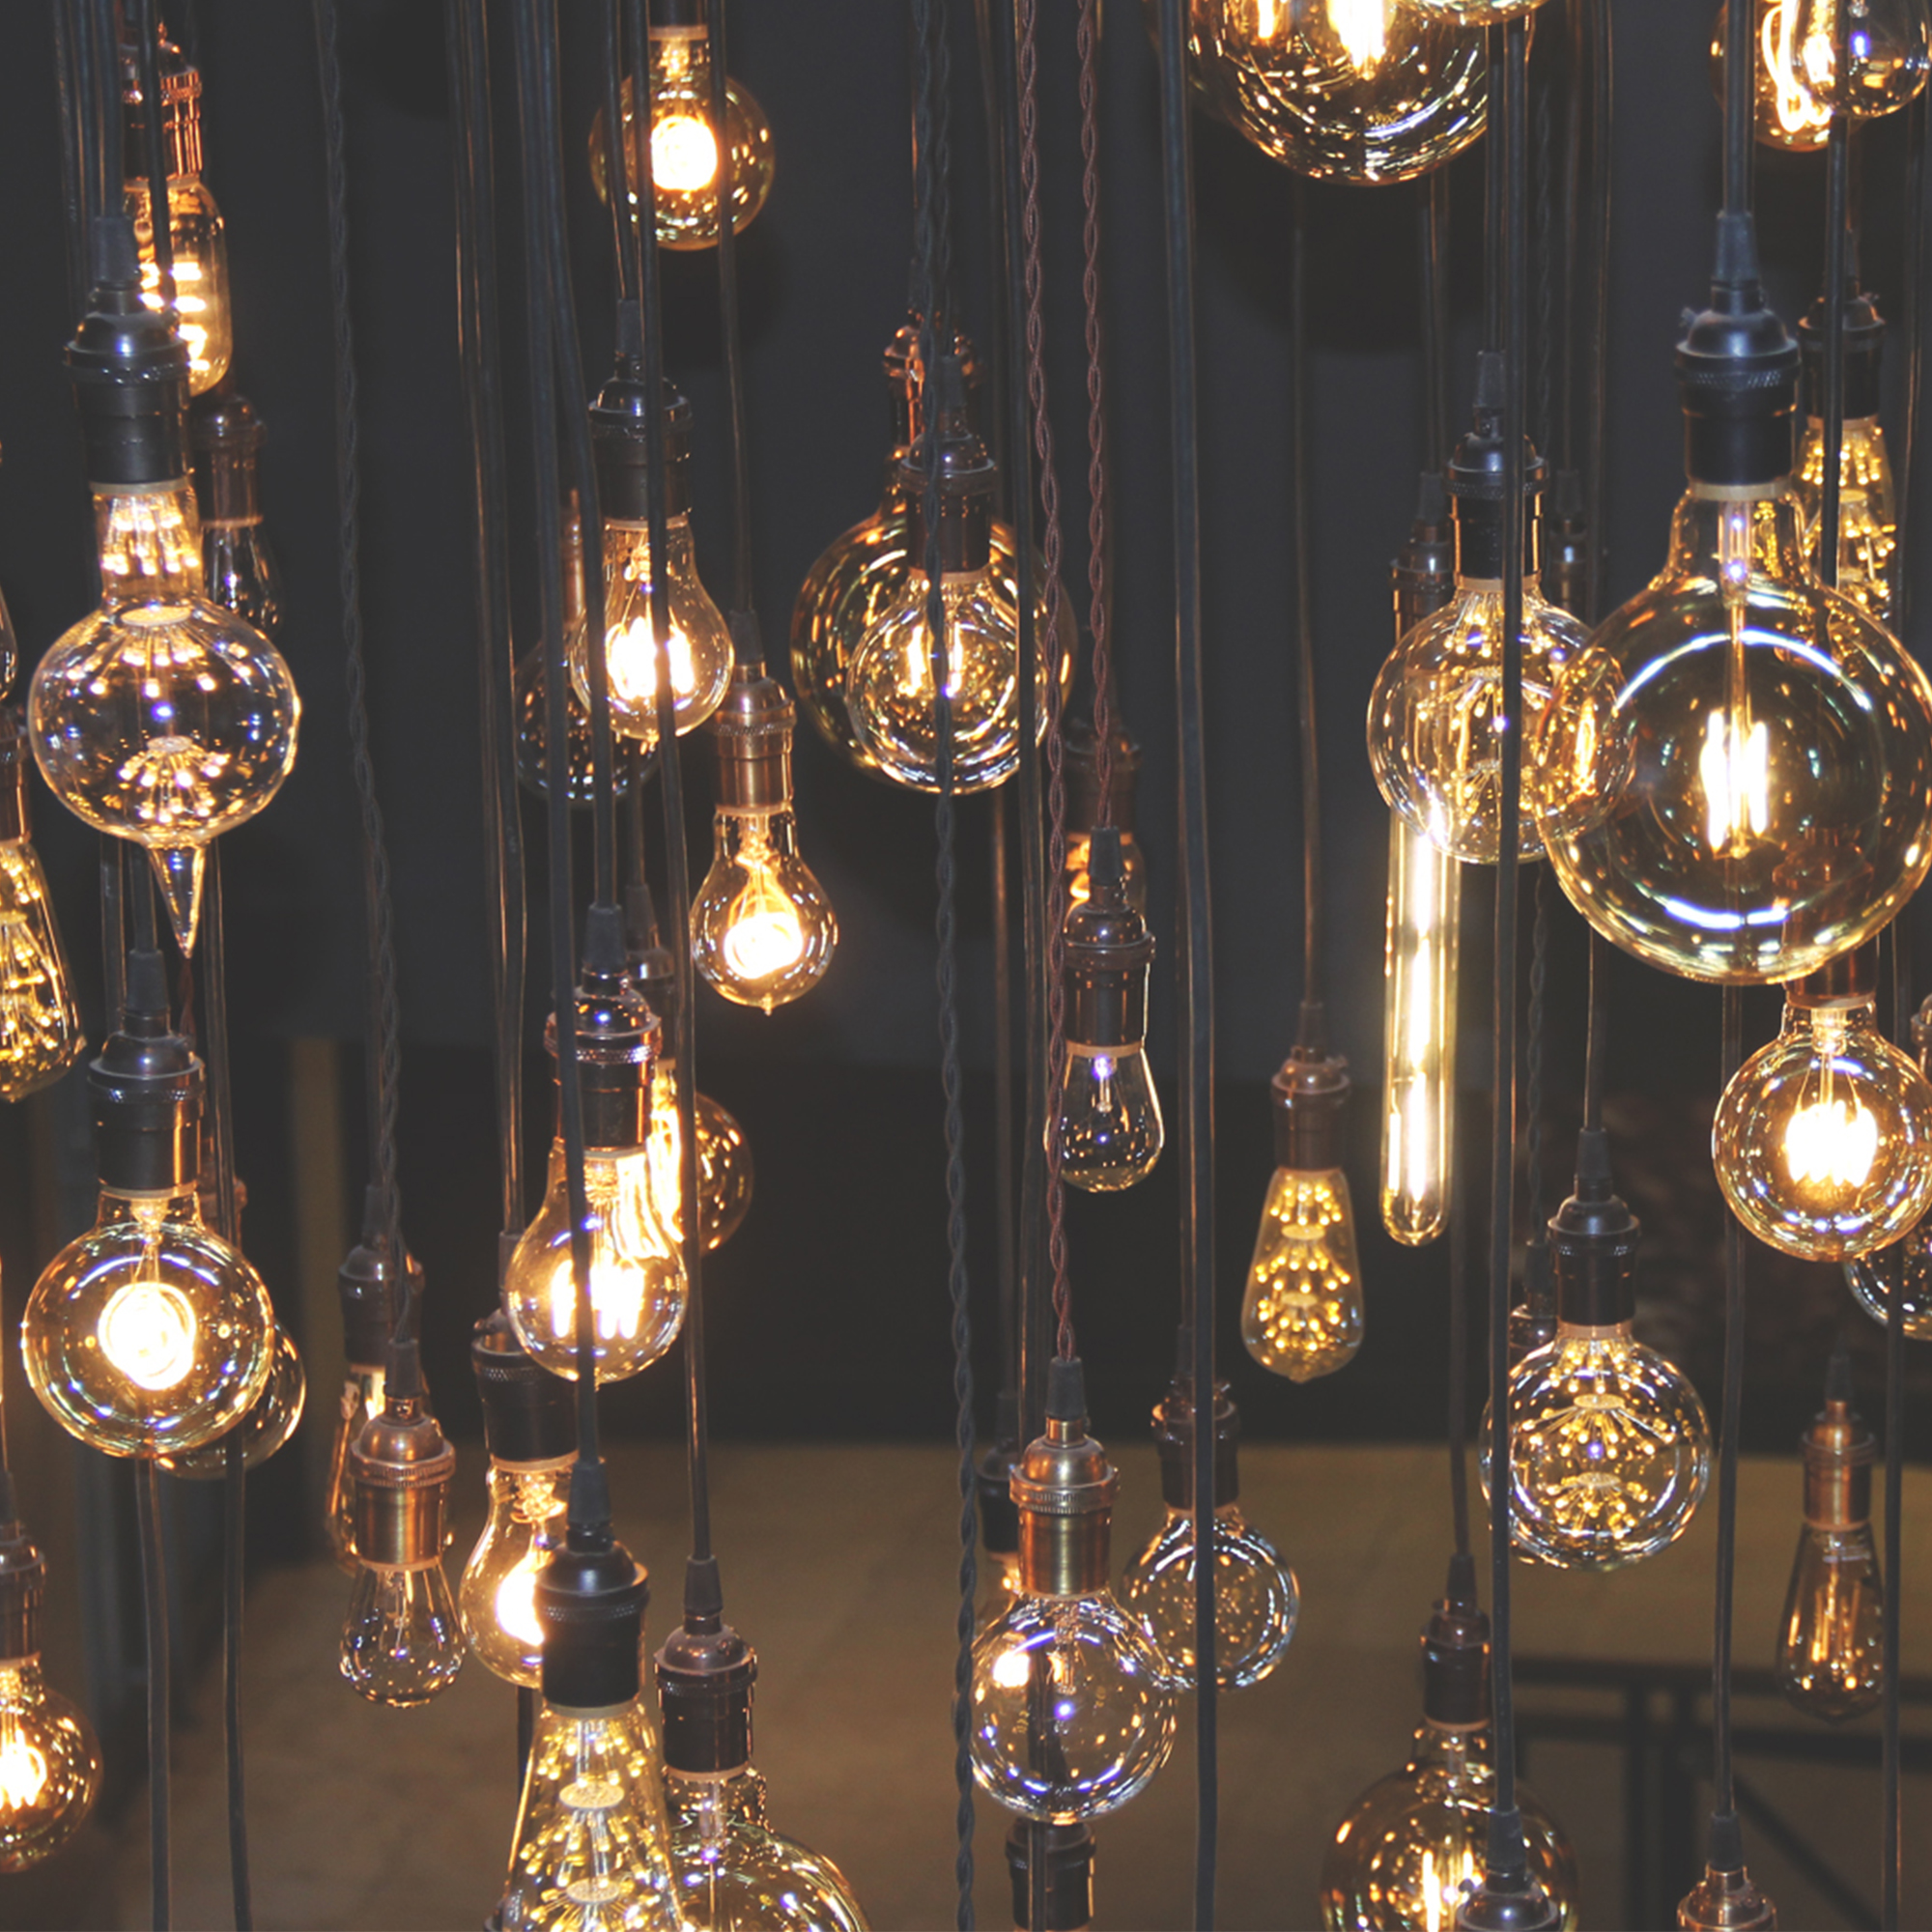 Nostalgic LED bulbs